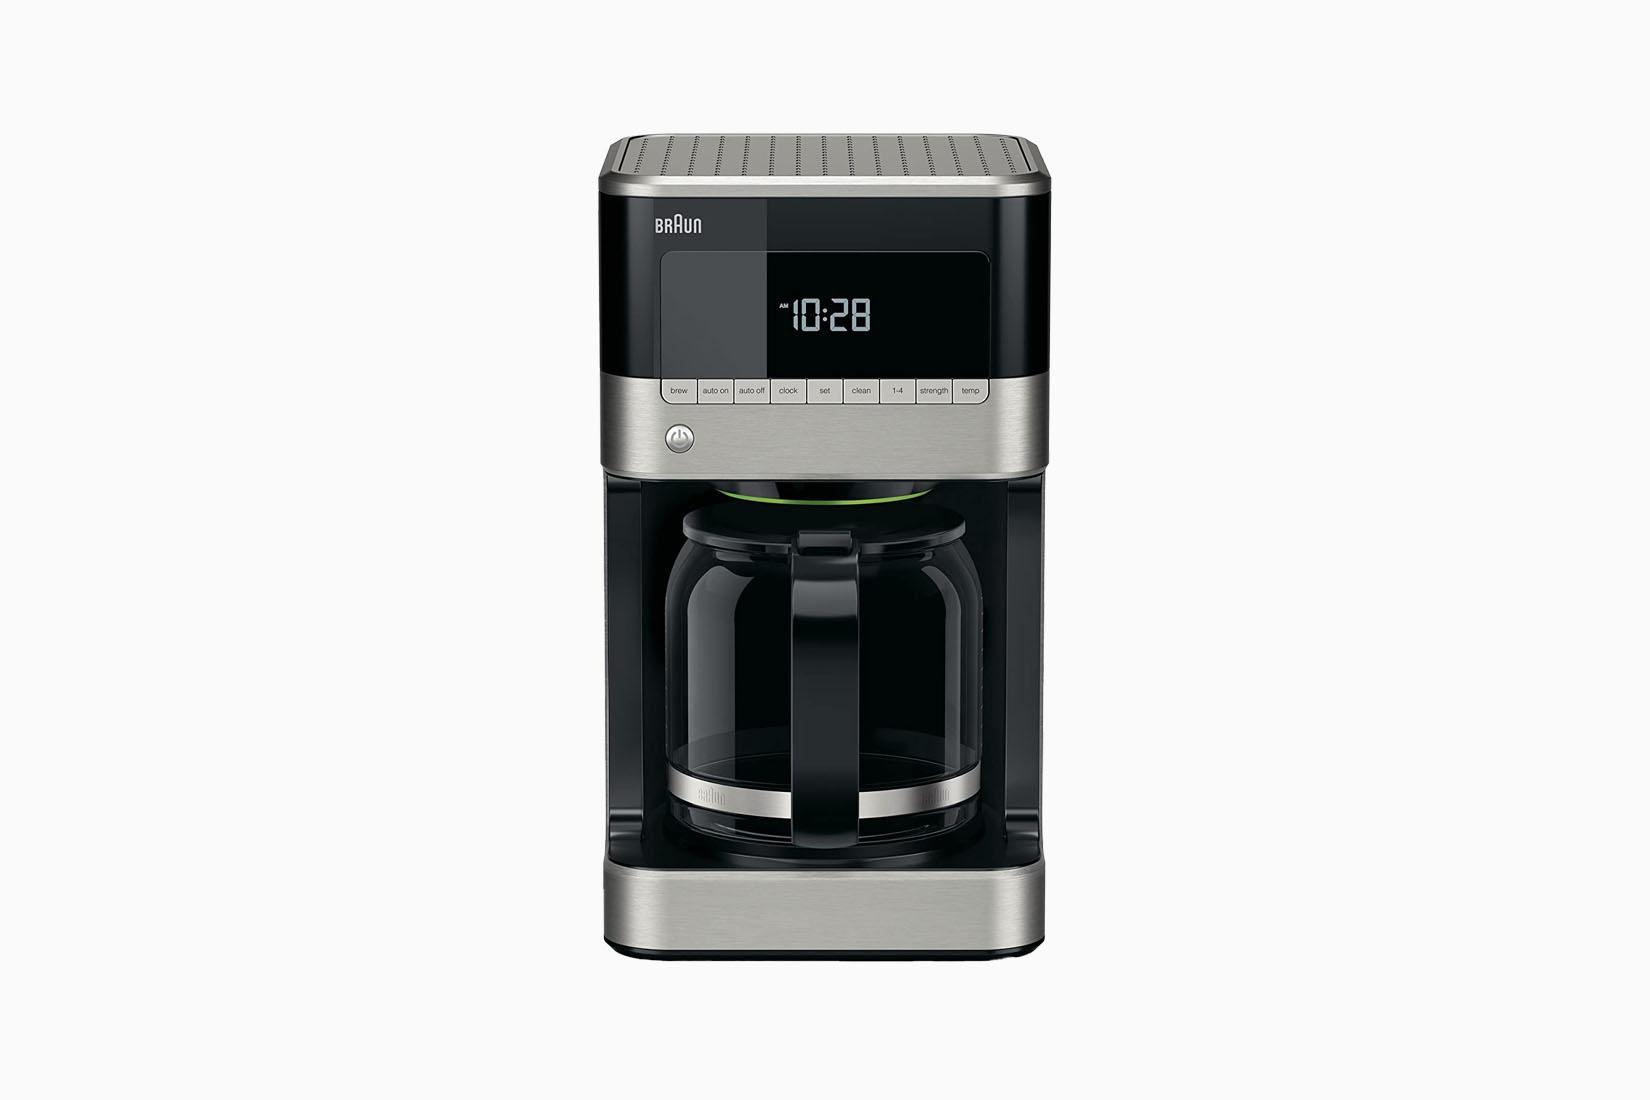 best drip coffee makers braun review Luxe Digital